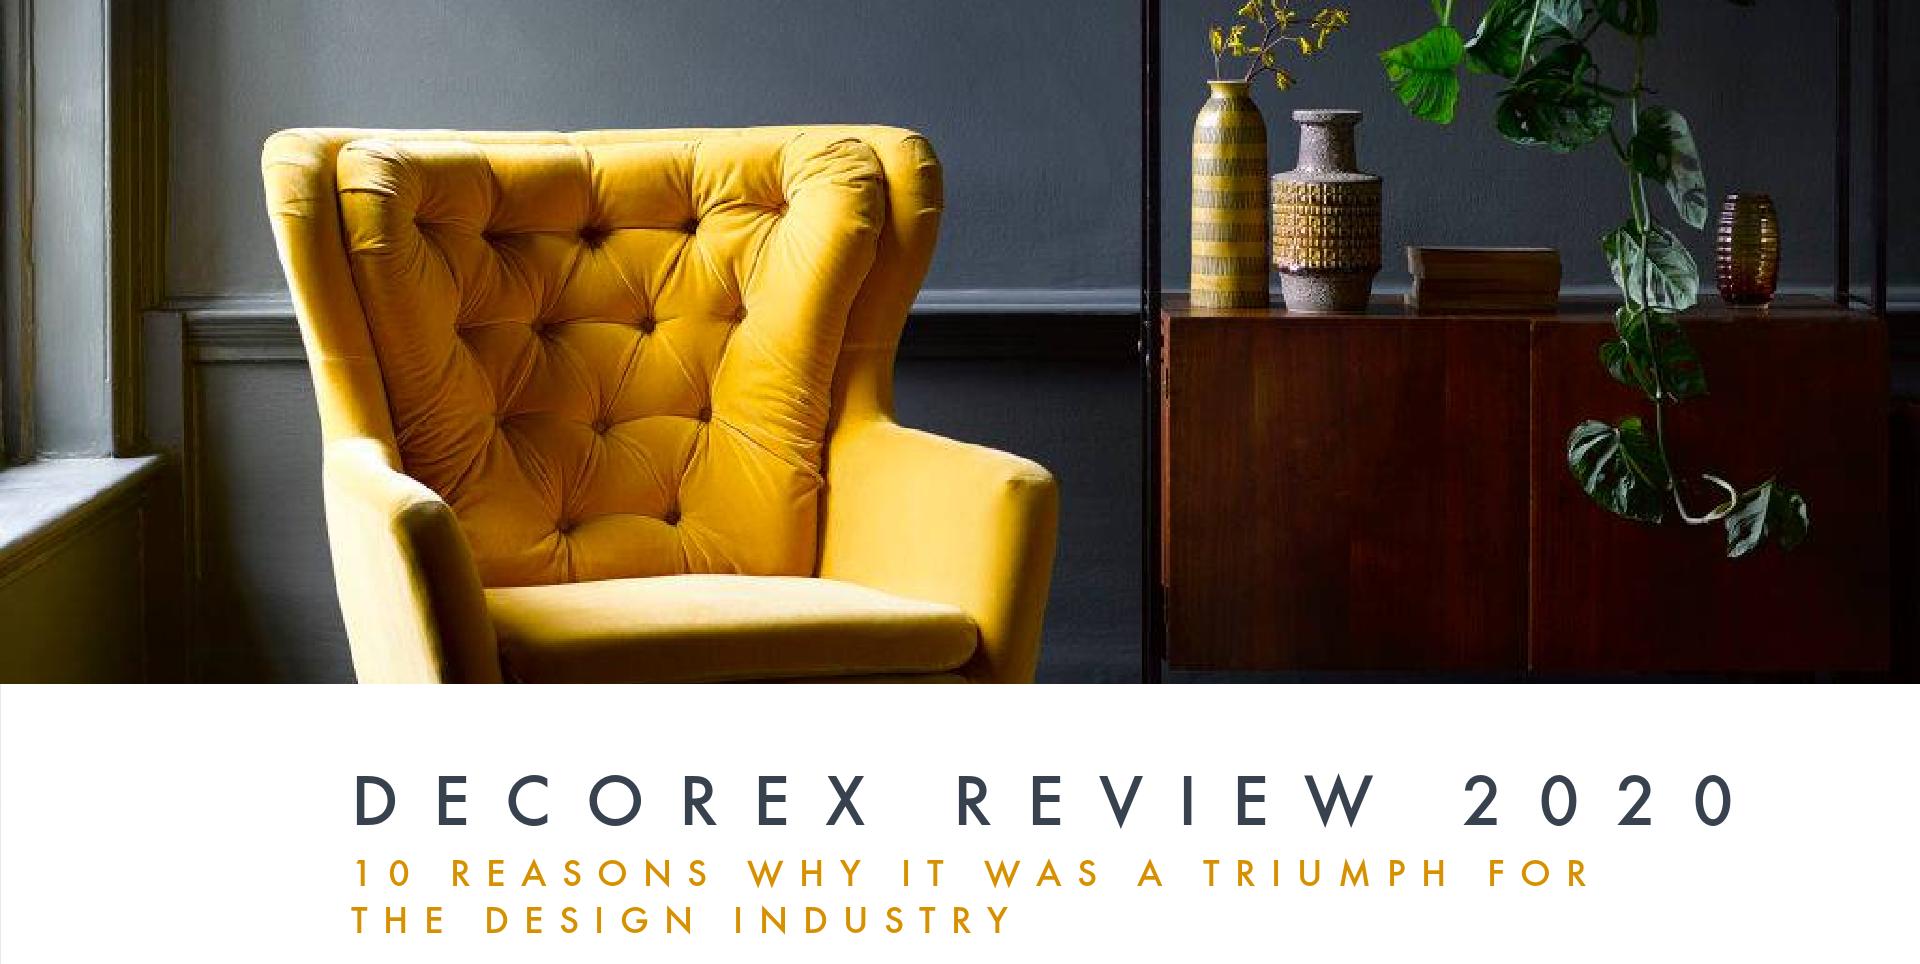 Decorex design show upholstery and interior design promo shots